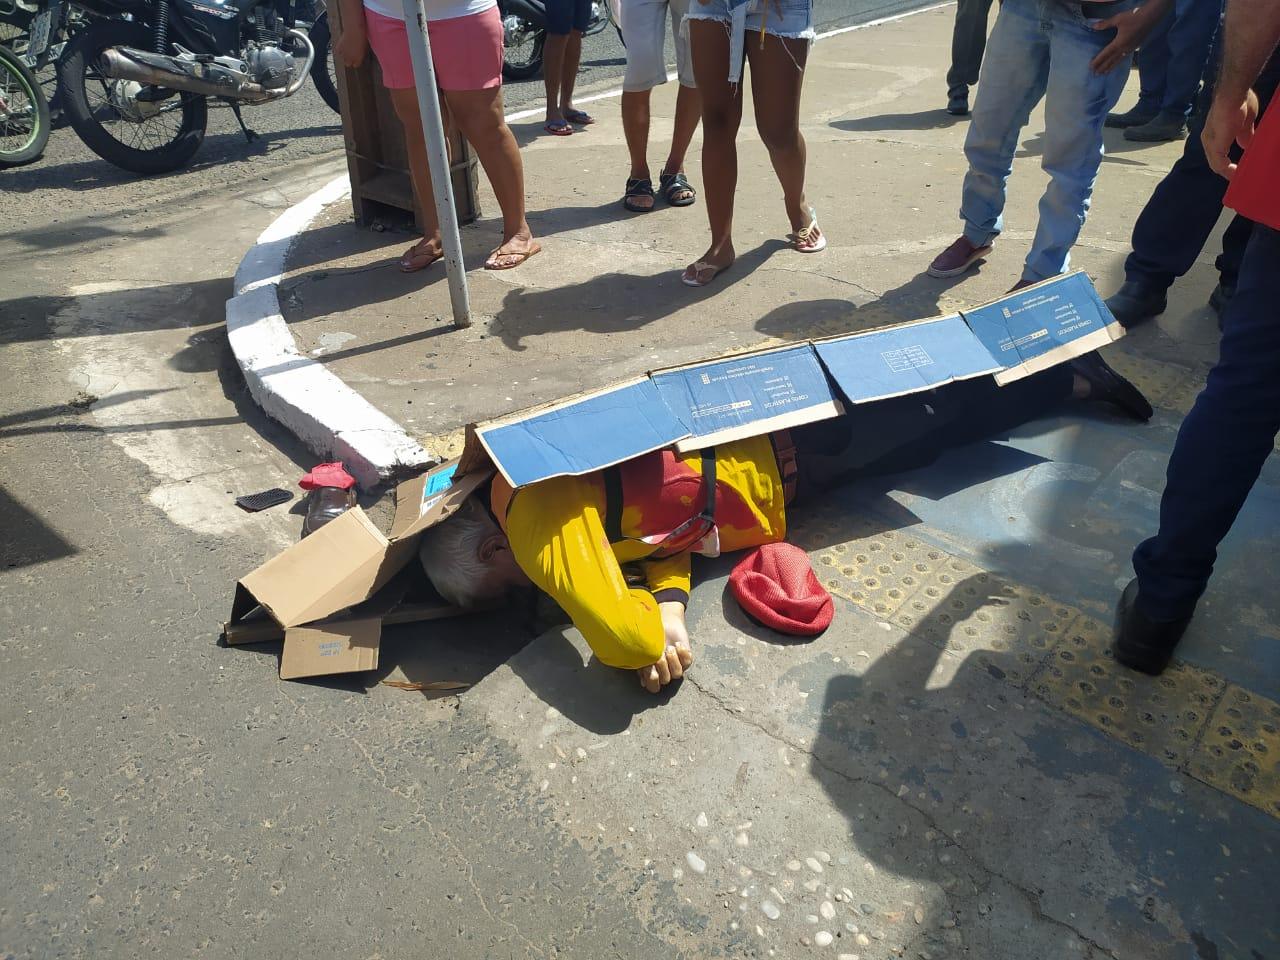 Mototaxista foi morto a tiros após discussão no Centro de Teresina - Foto: Ivan Lima/Portal MN